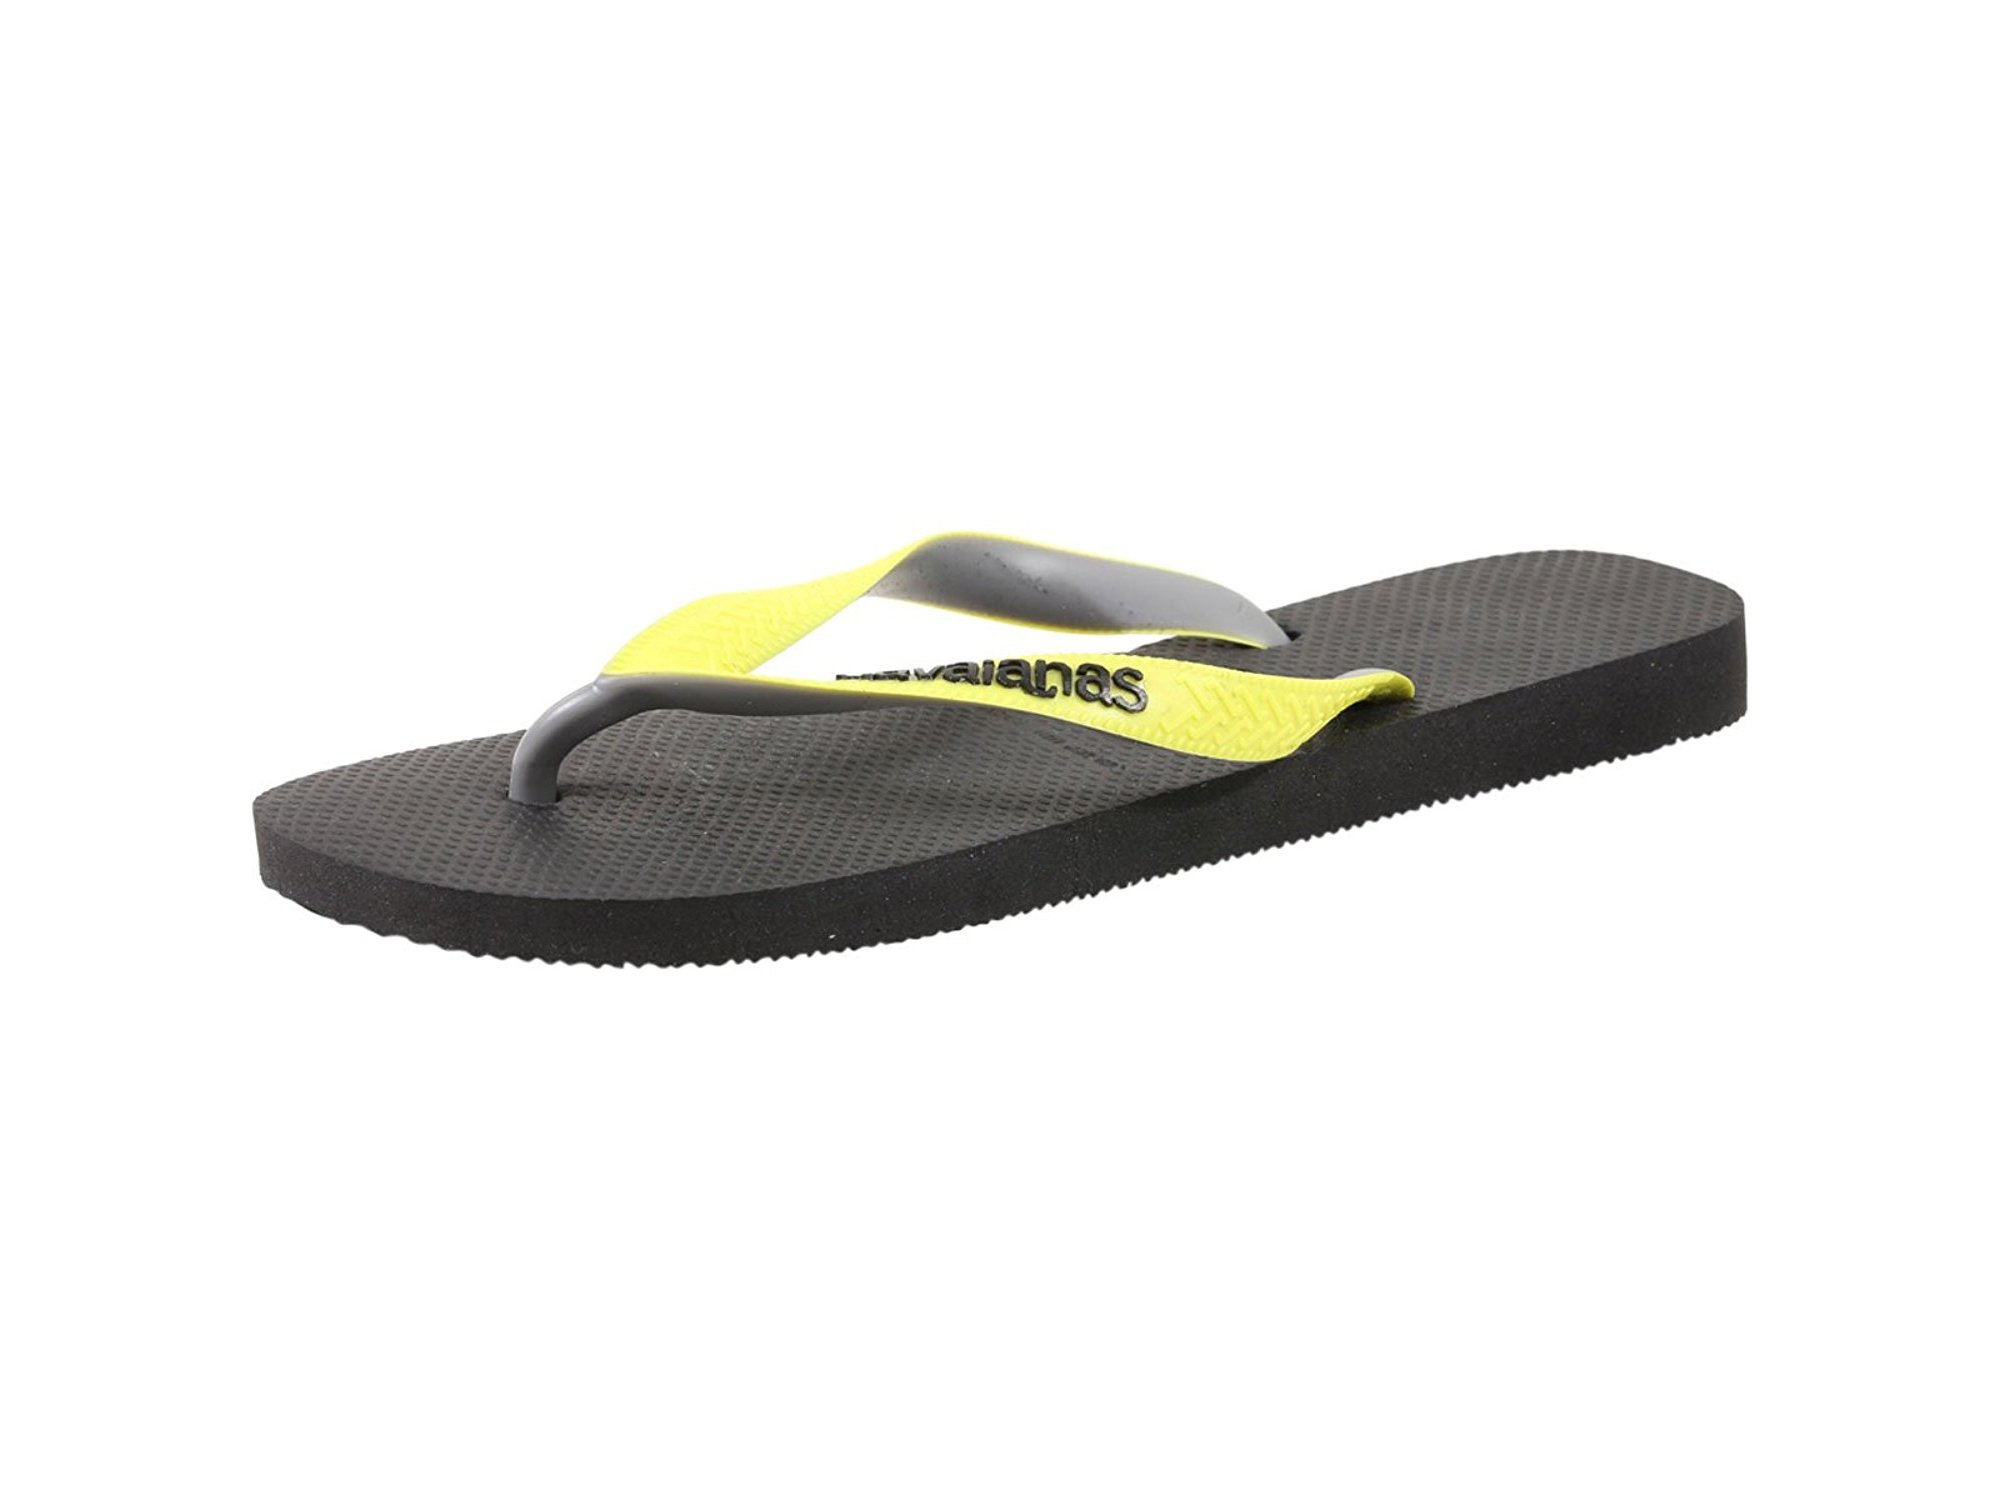 00ca72031b1 Havaianas Women s Top Mix Sandal Black Neon Yellow